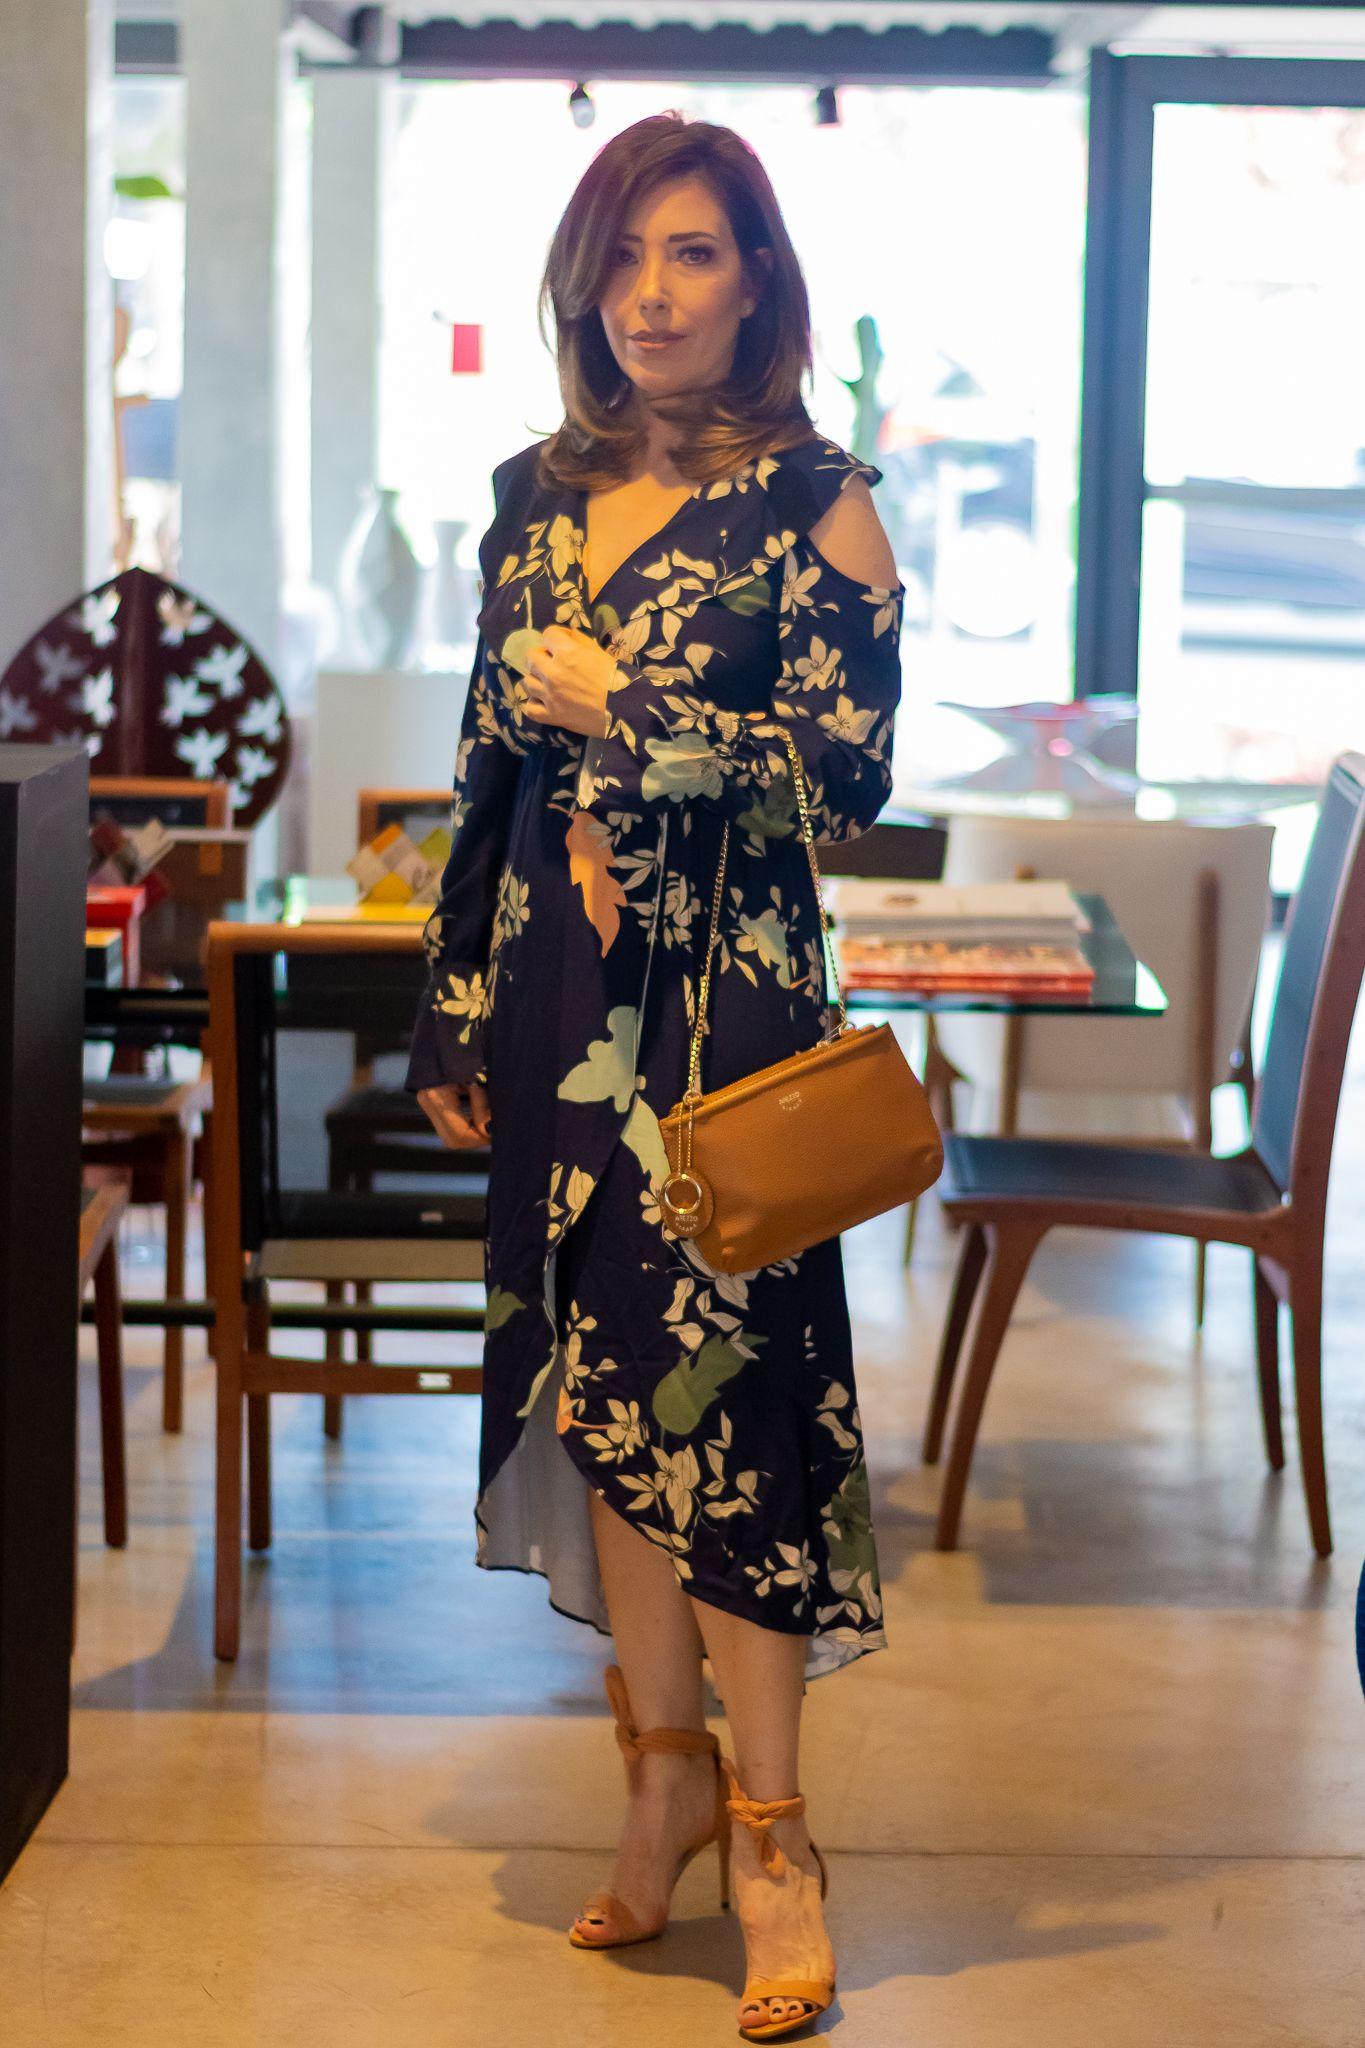 bb25ae294 Meu look: Vestido estampa floral Sandalia Isabelli | Meus looks ...